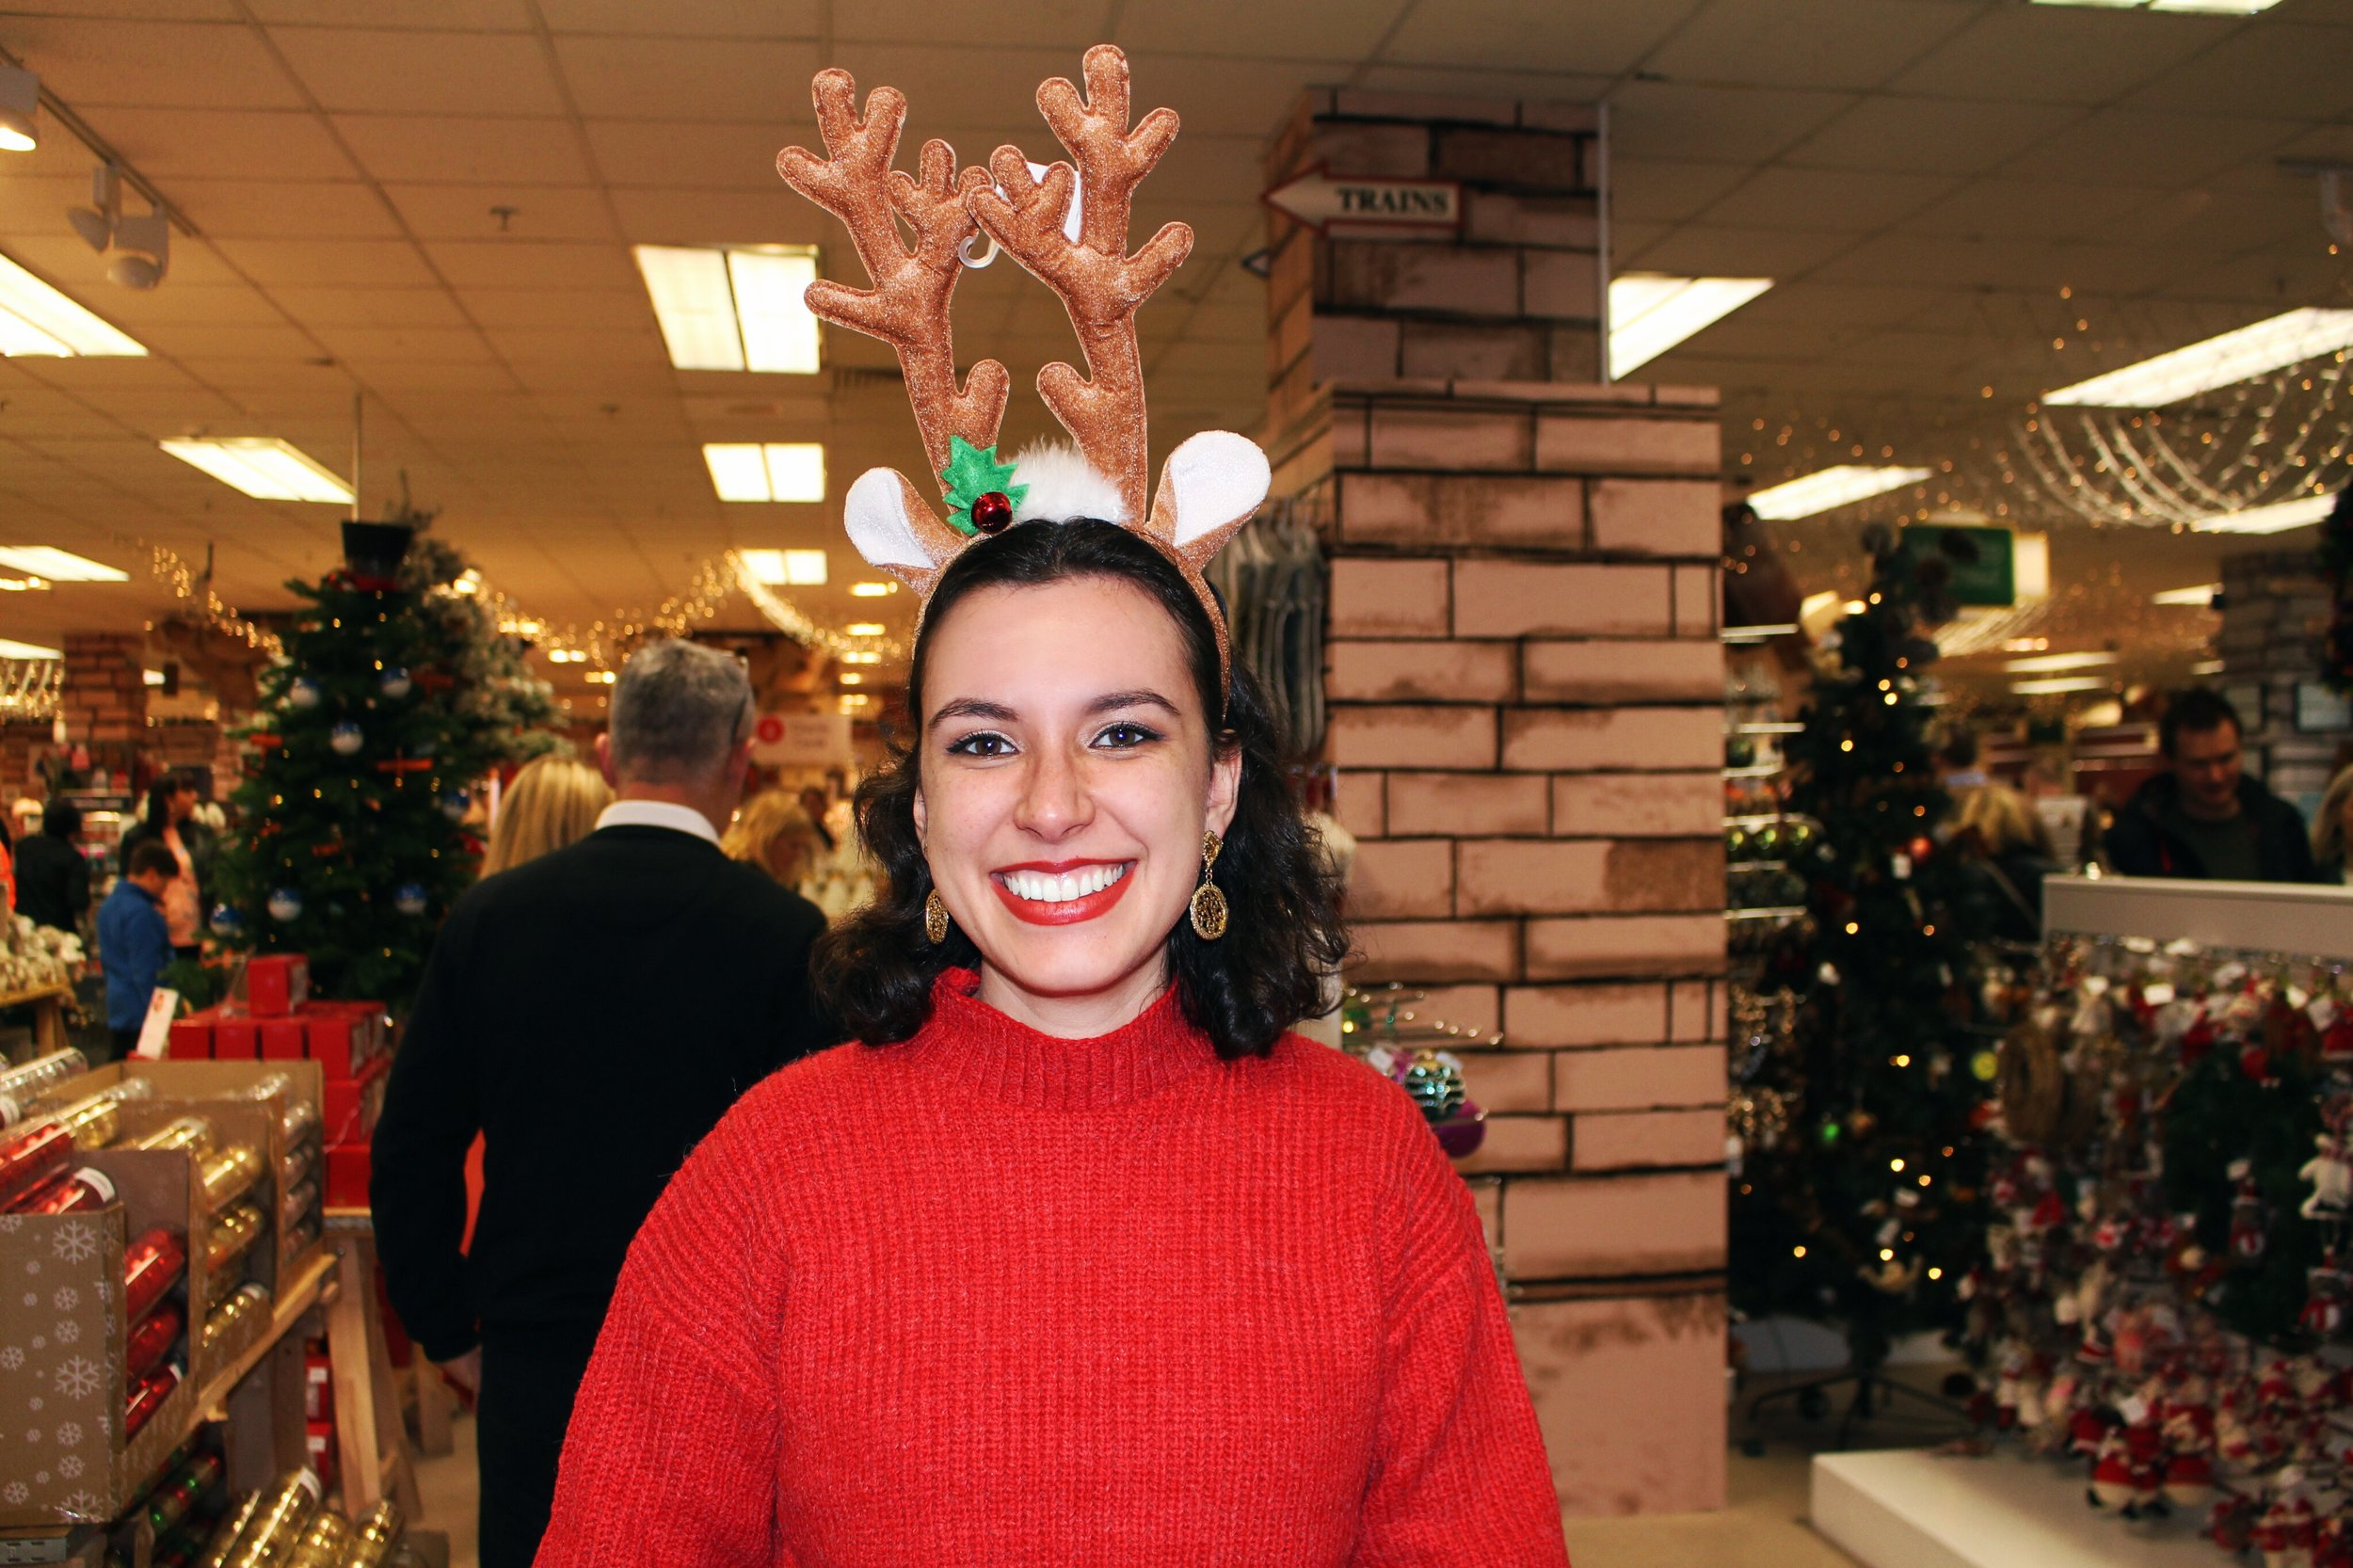 Reindeer Antlers Fenwick Department Store Newcastle Christmas Rhoyally Chic UK Style Blogger